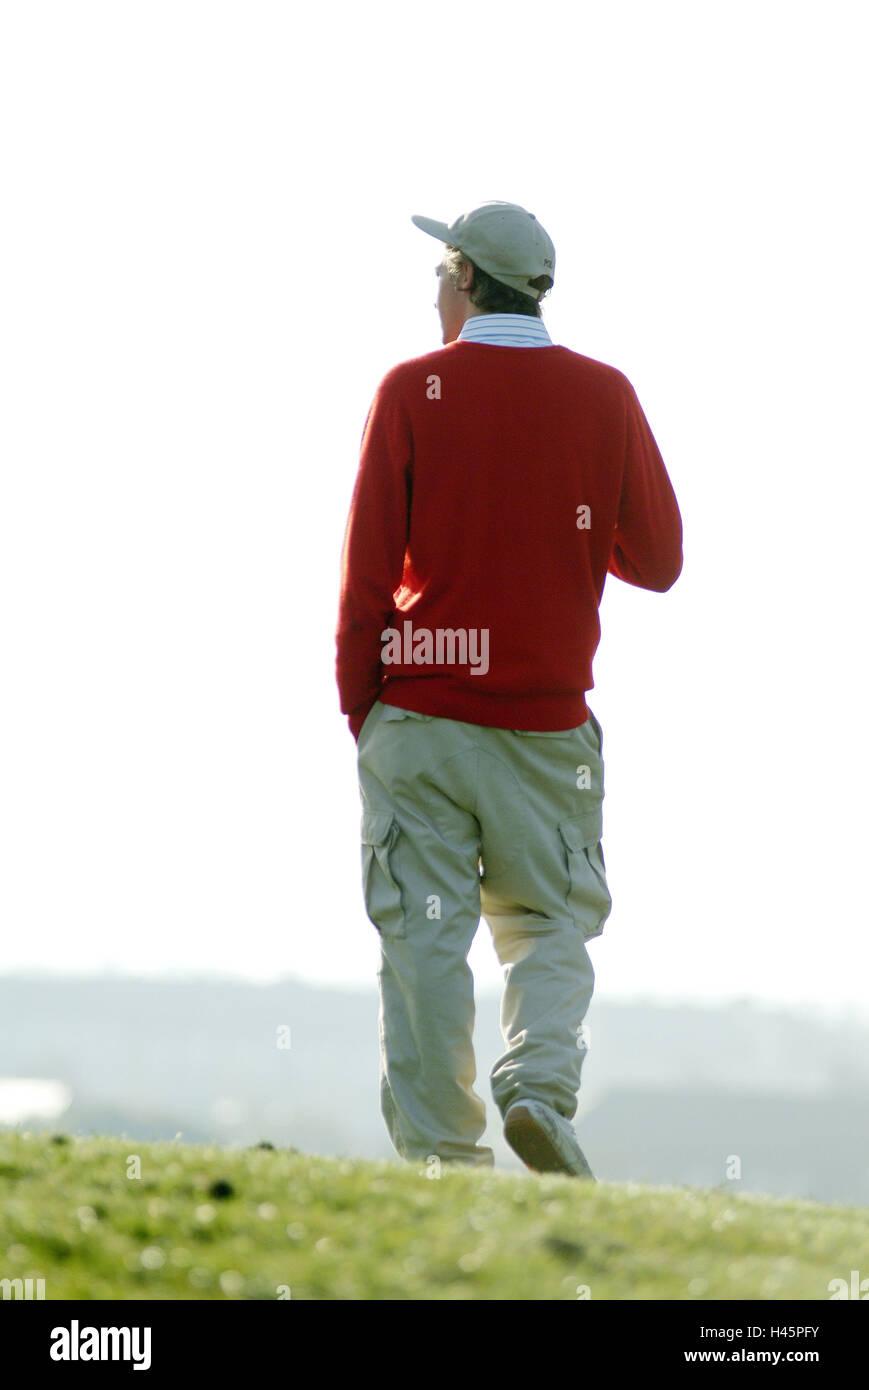 Man, young, walk, back opinion,,  Meadow, outlook,,   20-30 years, leisurewear, headgear, Basecap, hands, pants - Stock Image